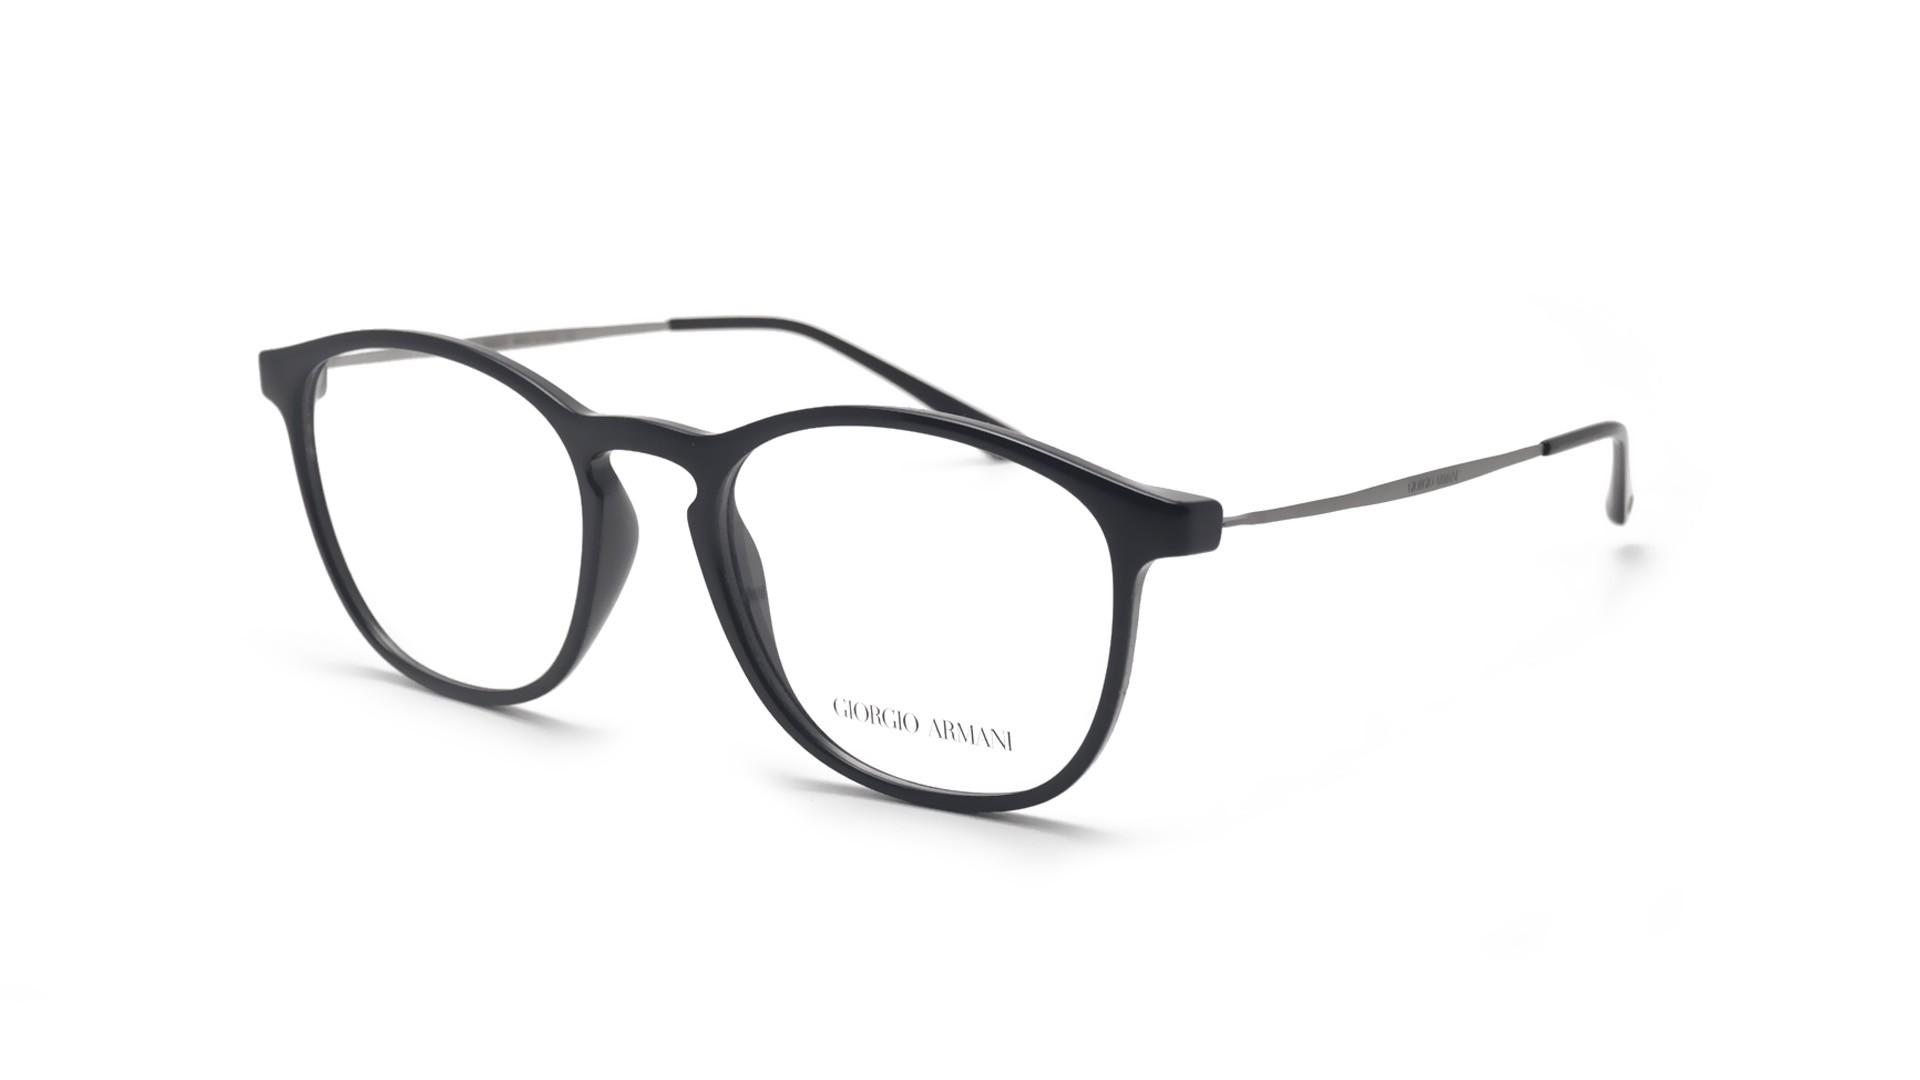 51fd5d4e8277 Eyeglasses Giorgio Armani Frames Of Life Black AR7141 5017 52-19 Large